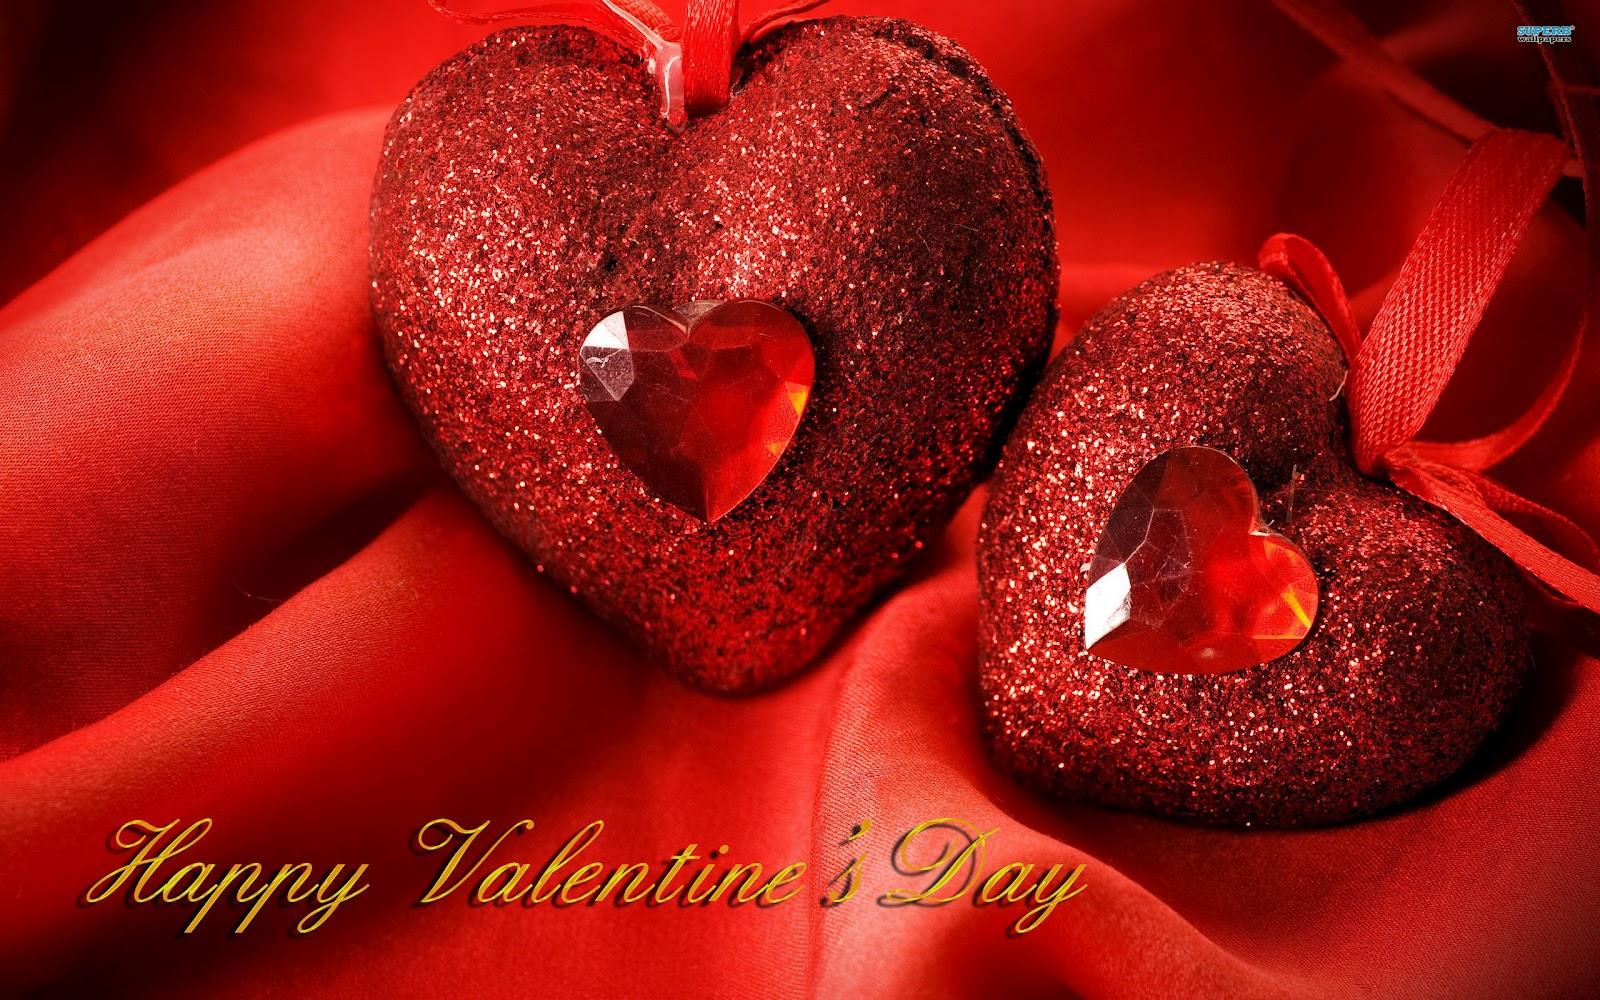 hinh-anh-dep-keo-socola-cho-ngay-le-valentine-14-2-2016-5